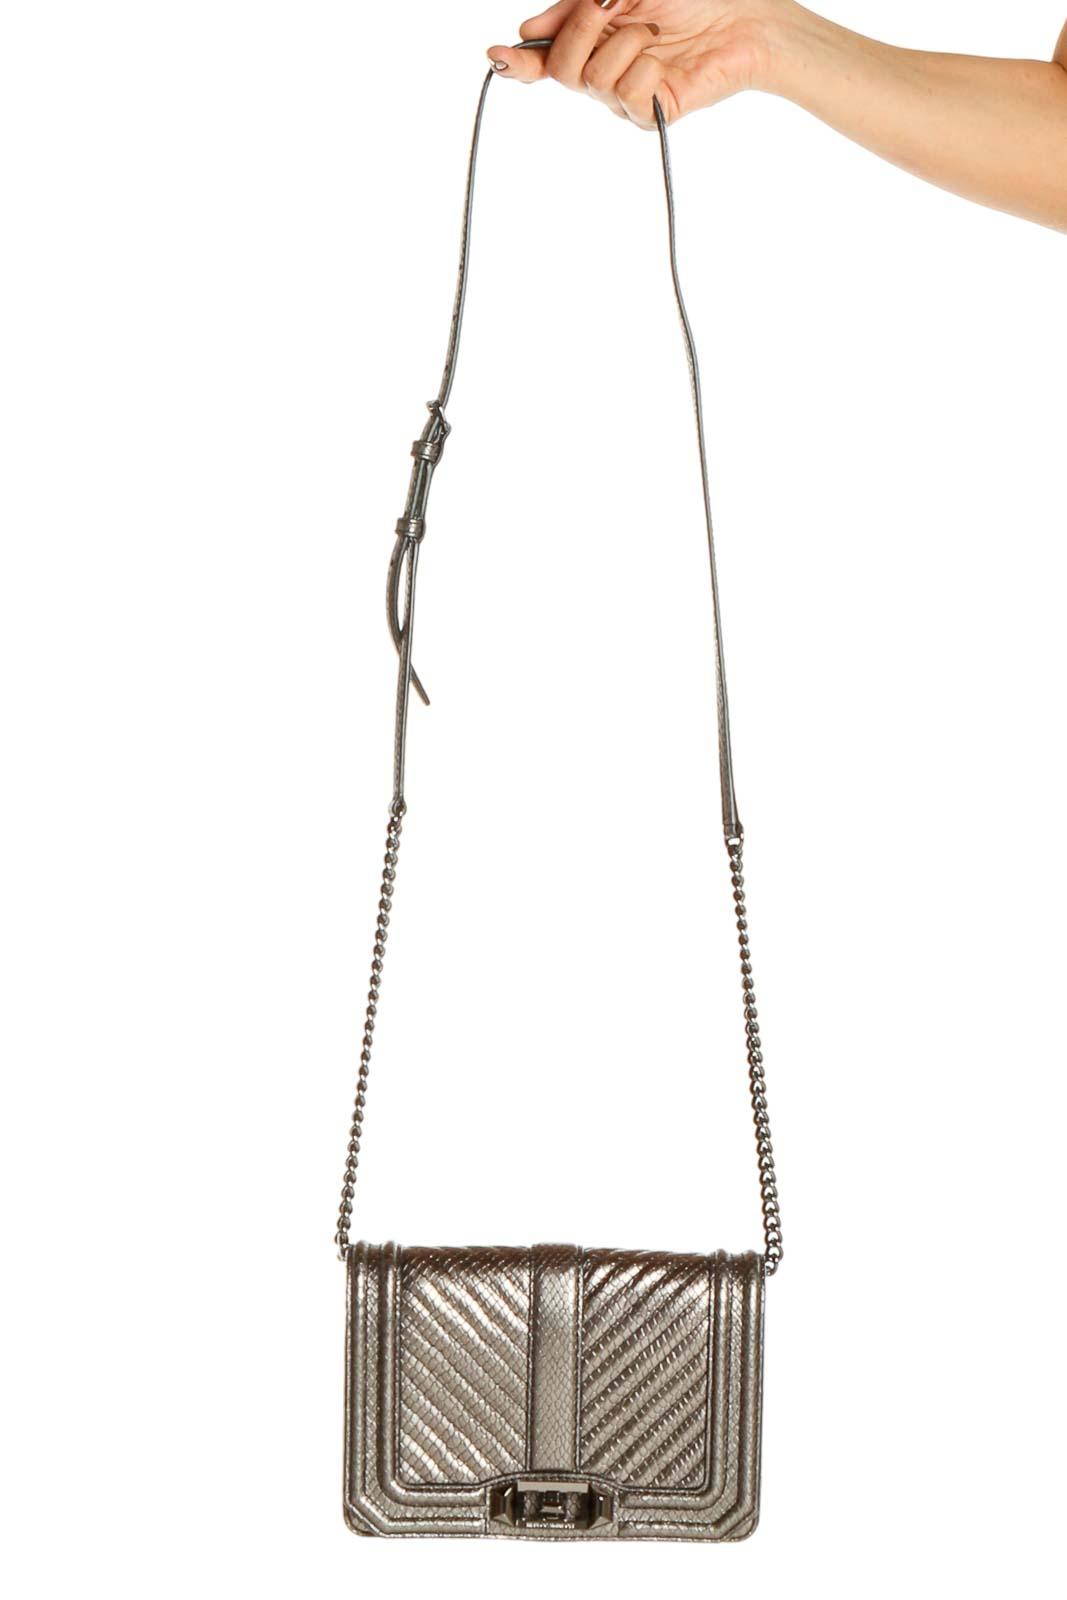 Silver Crossbody Bag Front